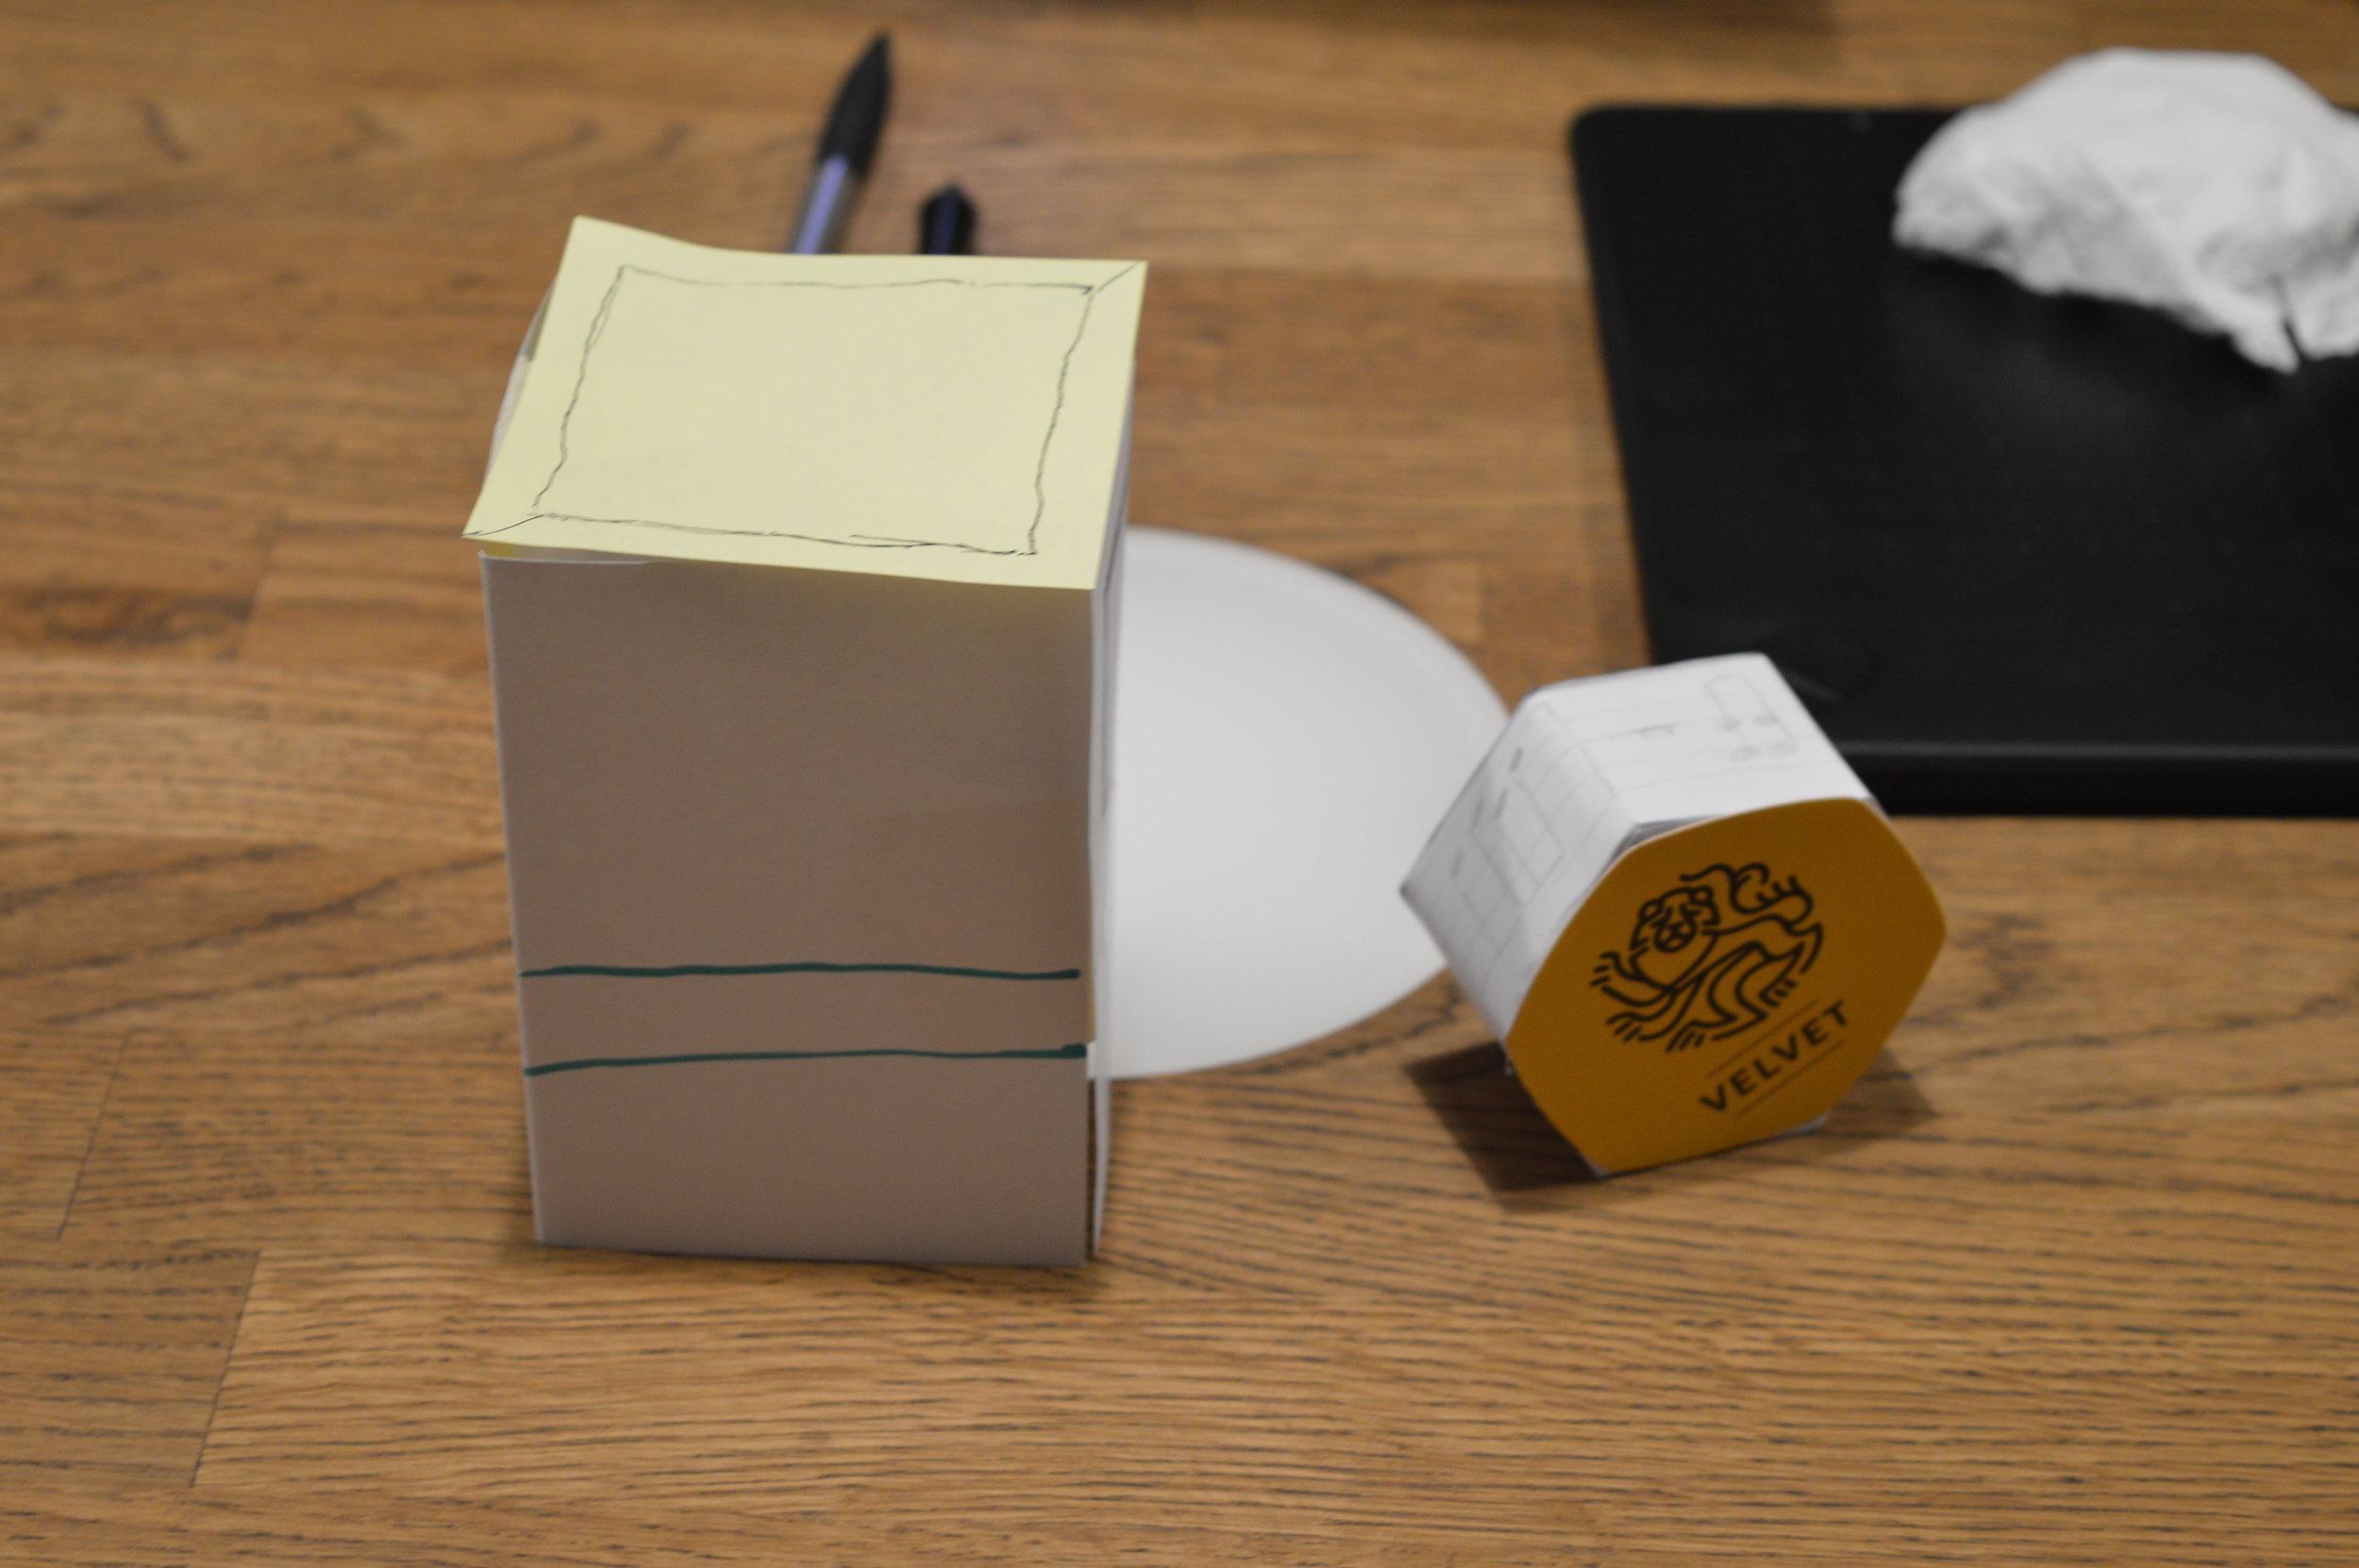 Jukebox_prototyping_DSC_0091.JPG